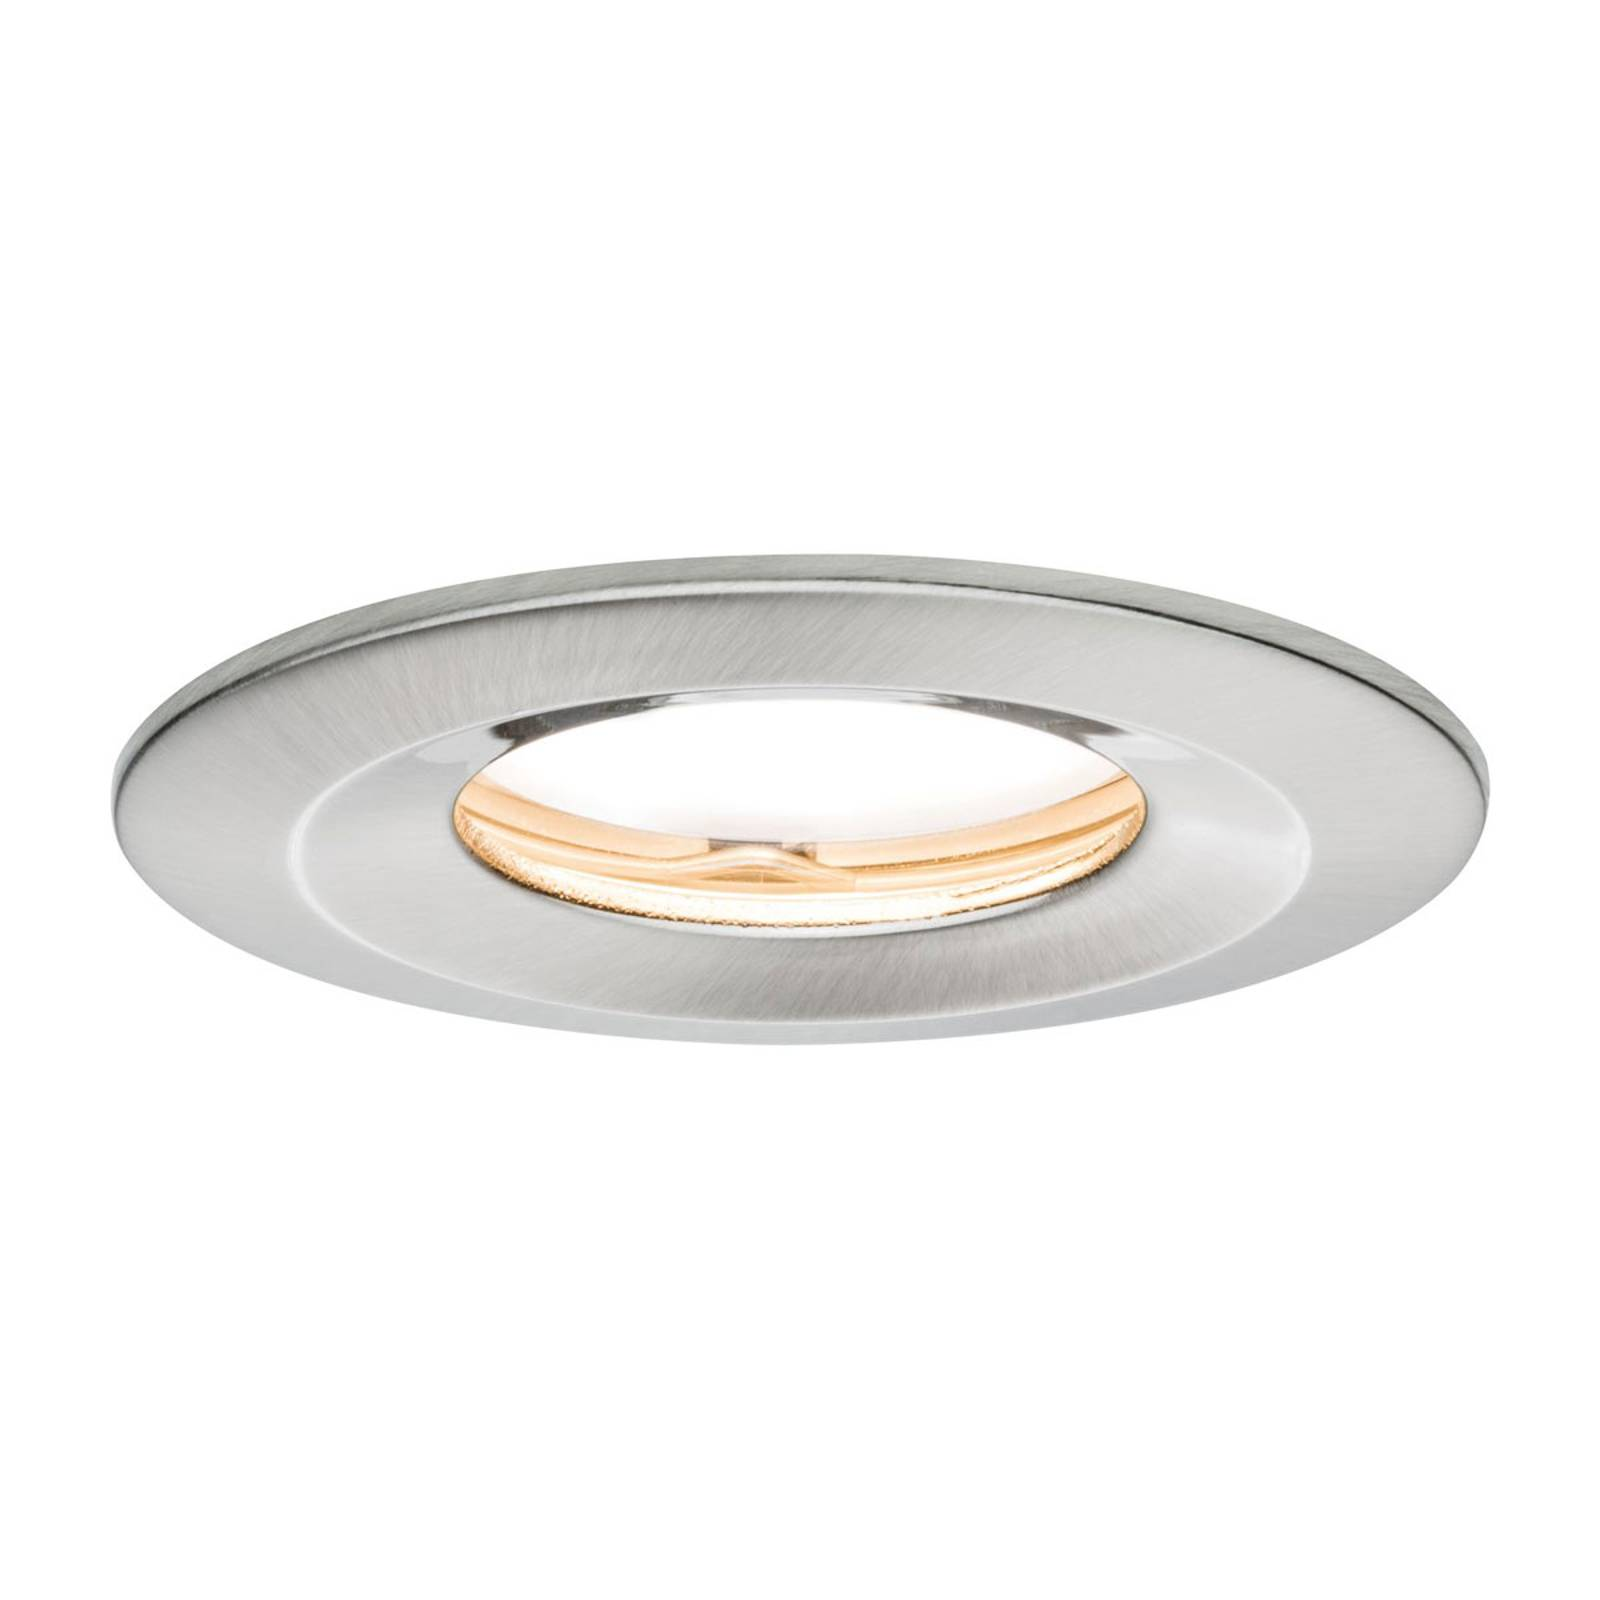 Paulmann LED-spotti Slim Coin himmennys IP65 rauta